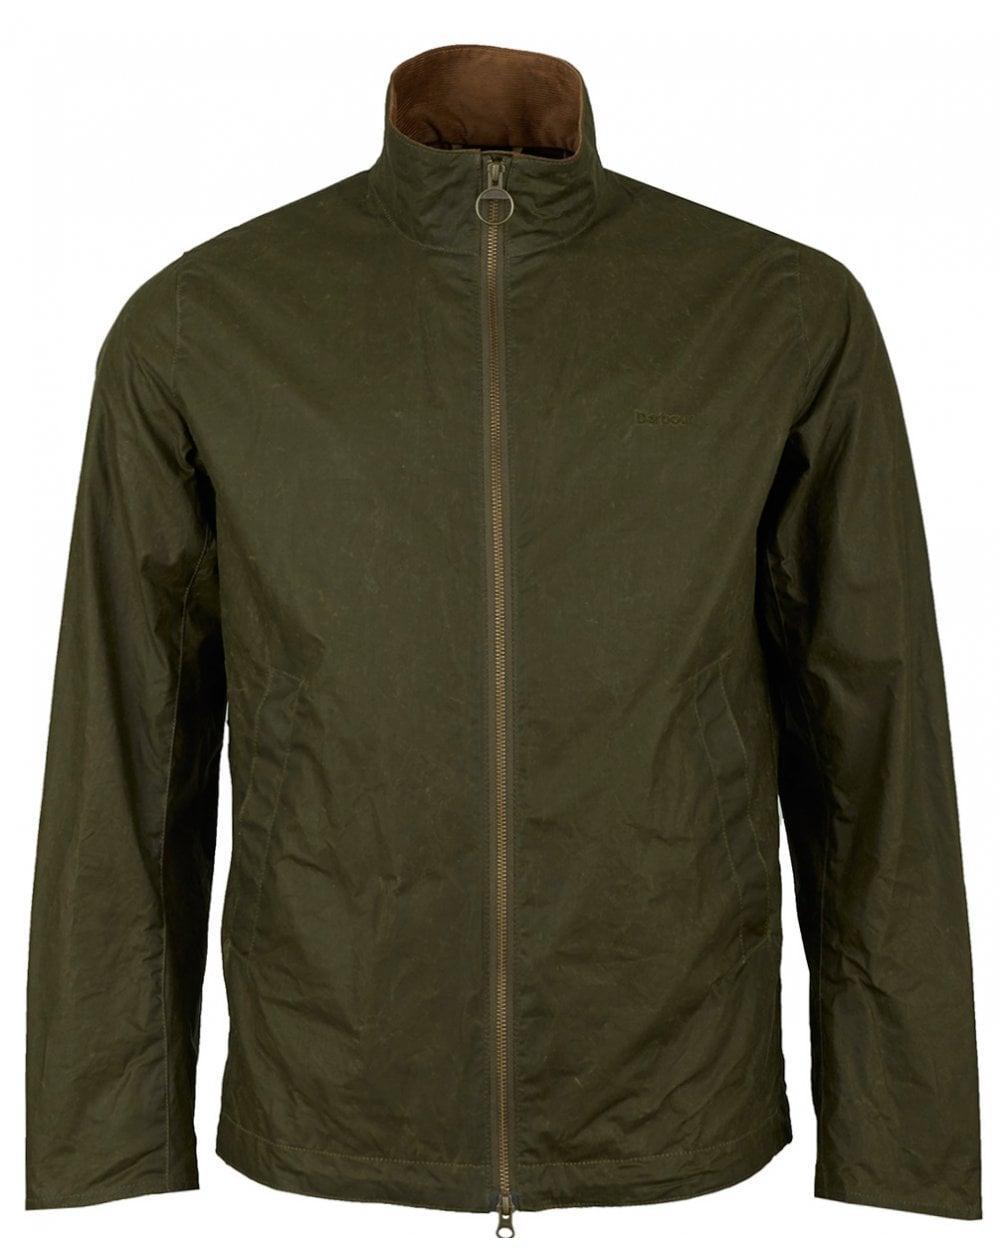 72b75e81b2f3 Barbour Lightweight Admiralty Wax Jacket in Green for Men - Lyst